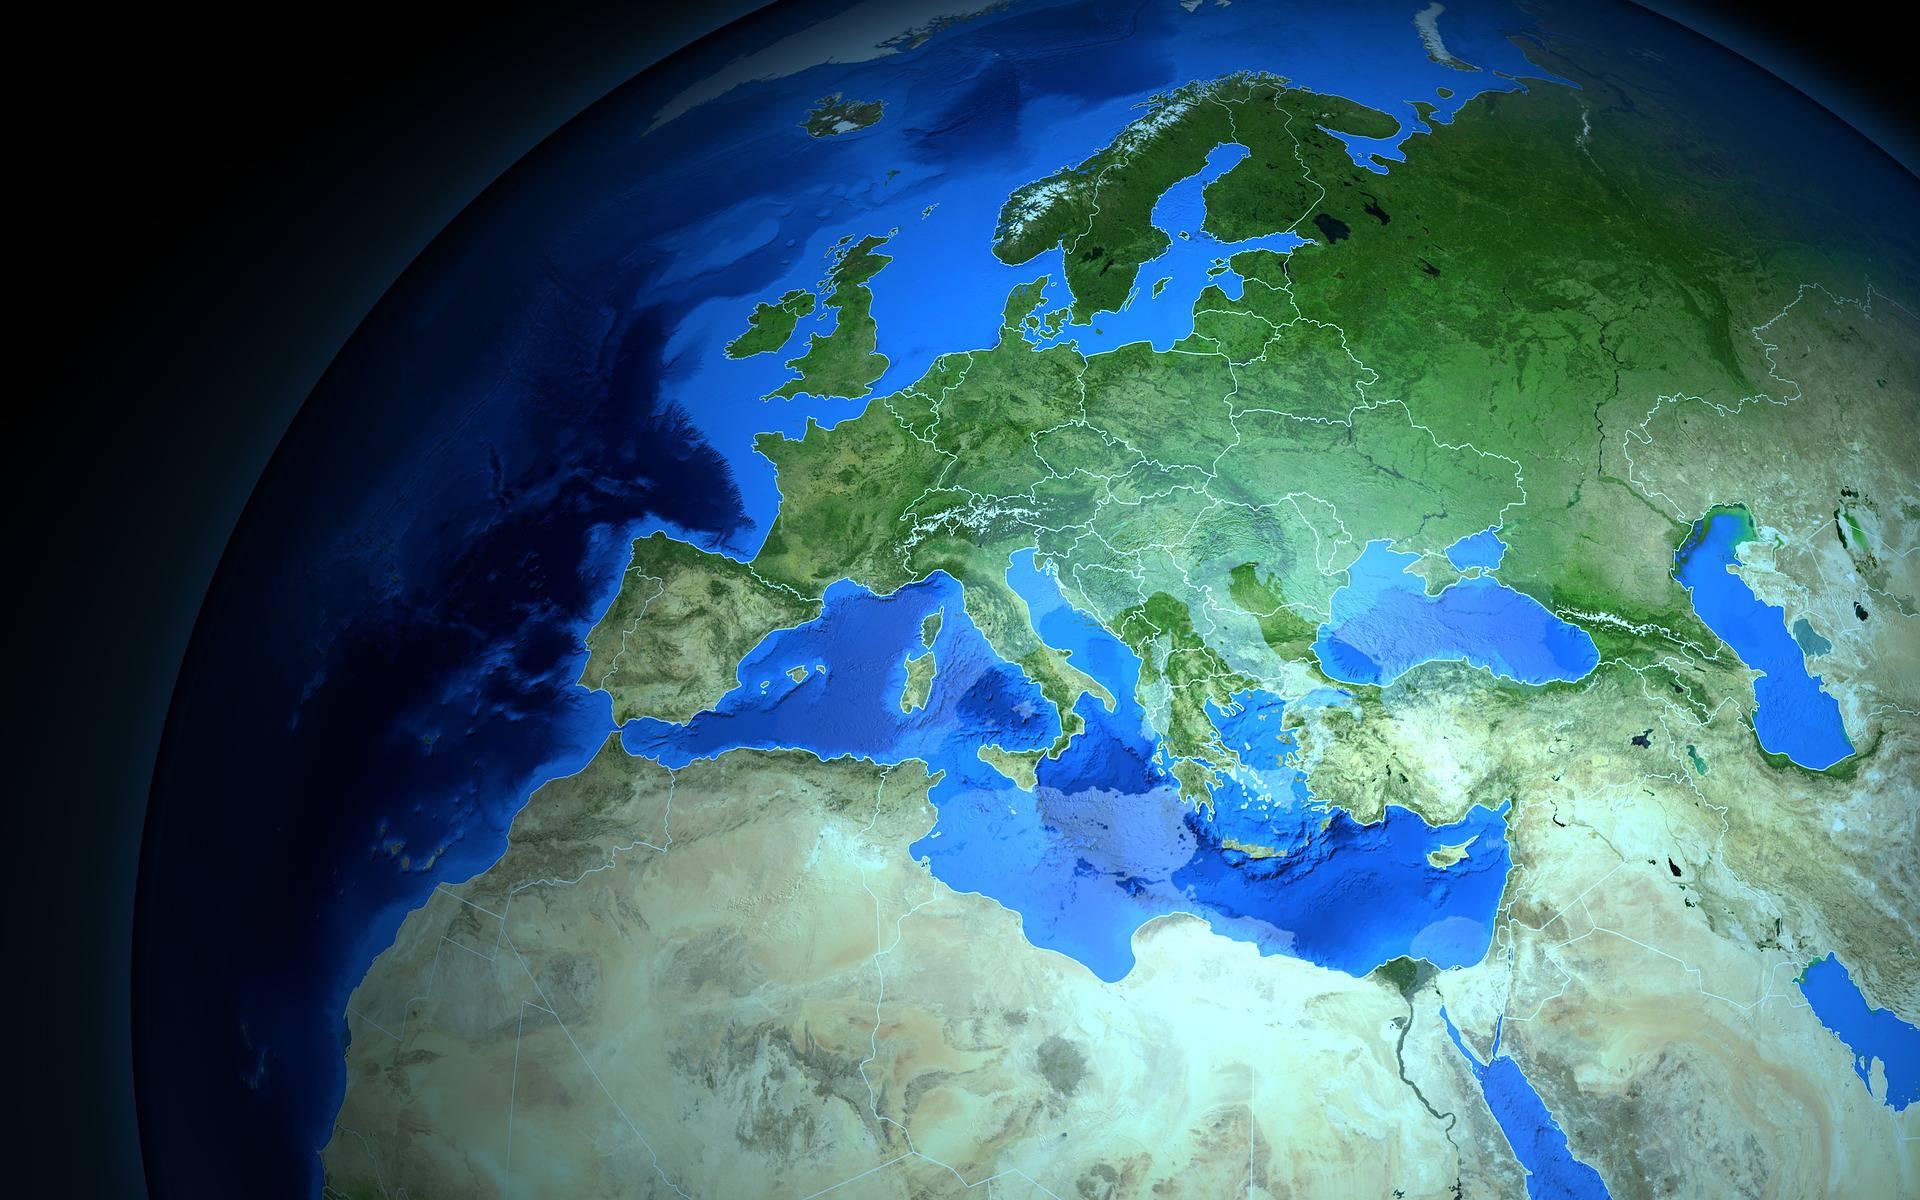 map-of-europe-3836709_1920.jpg